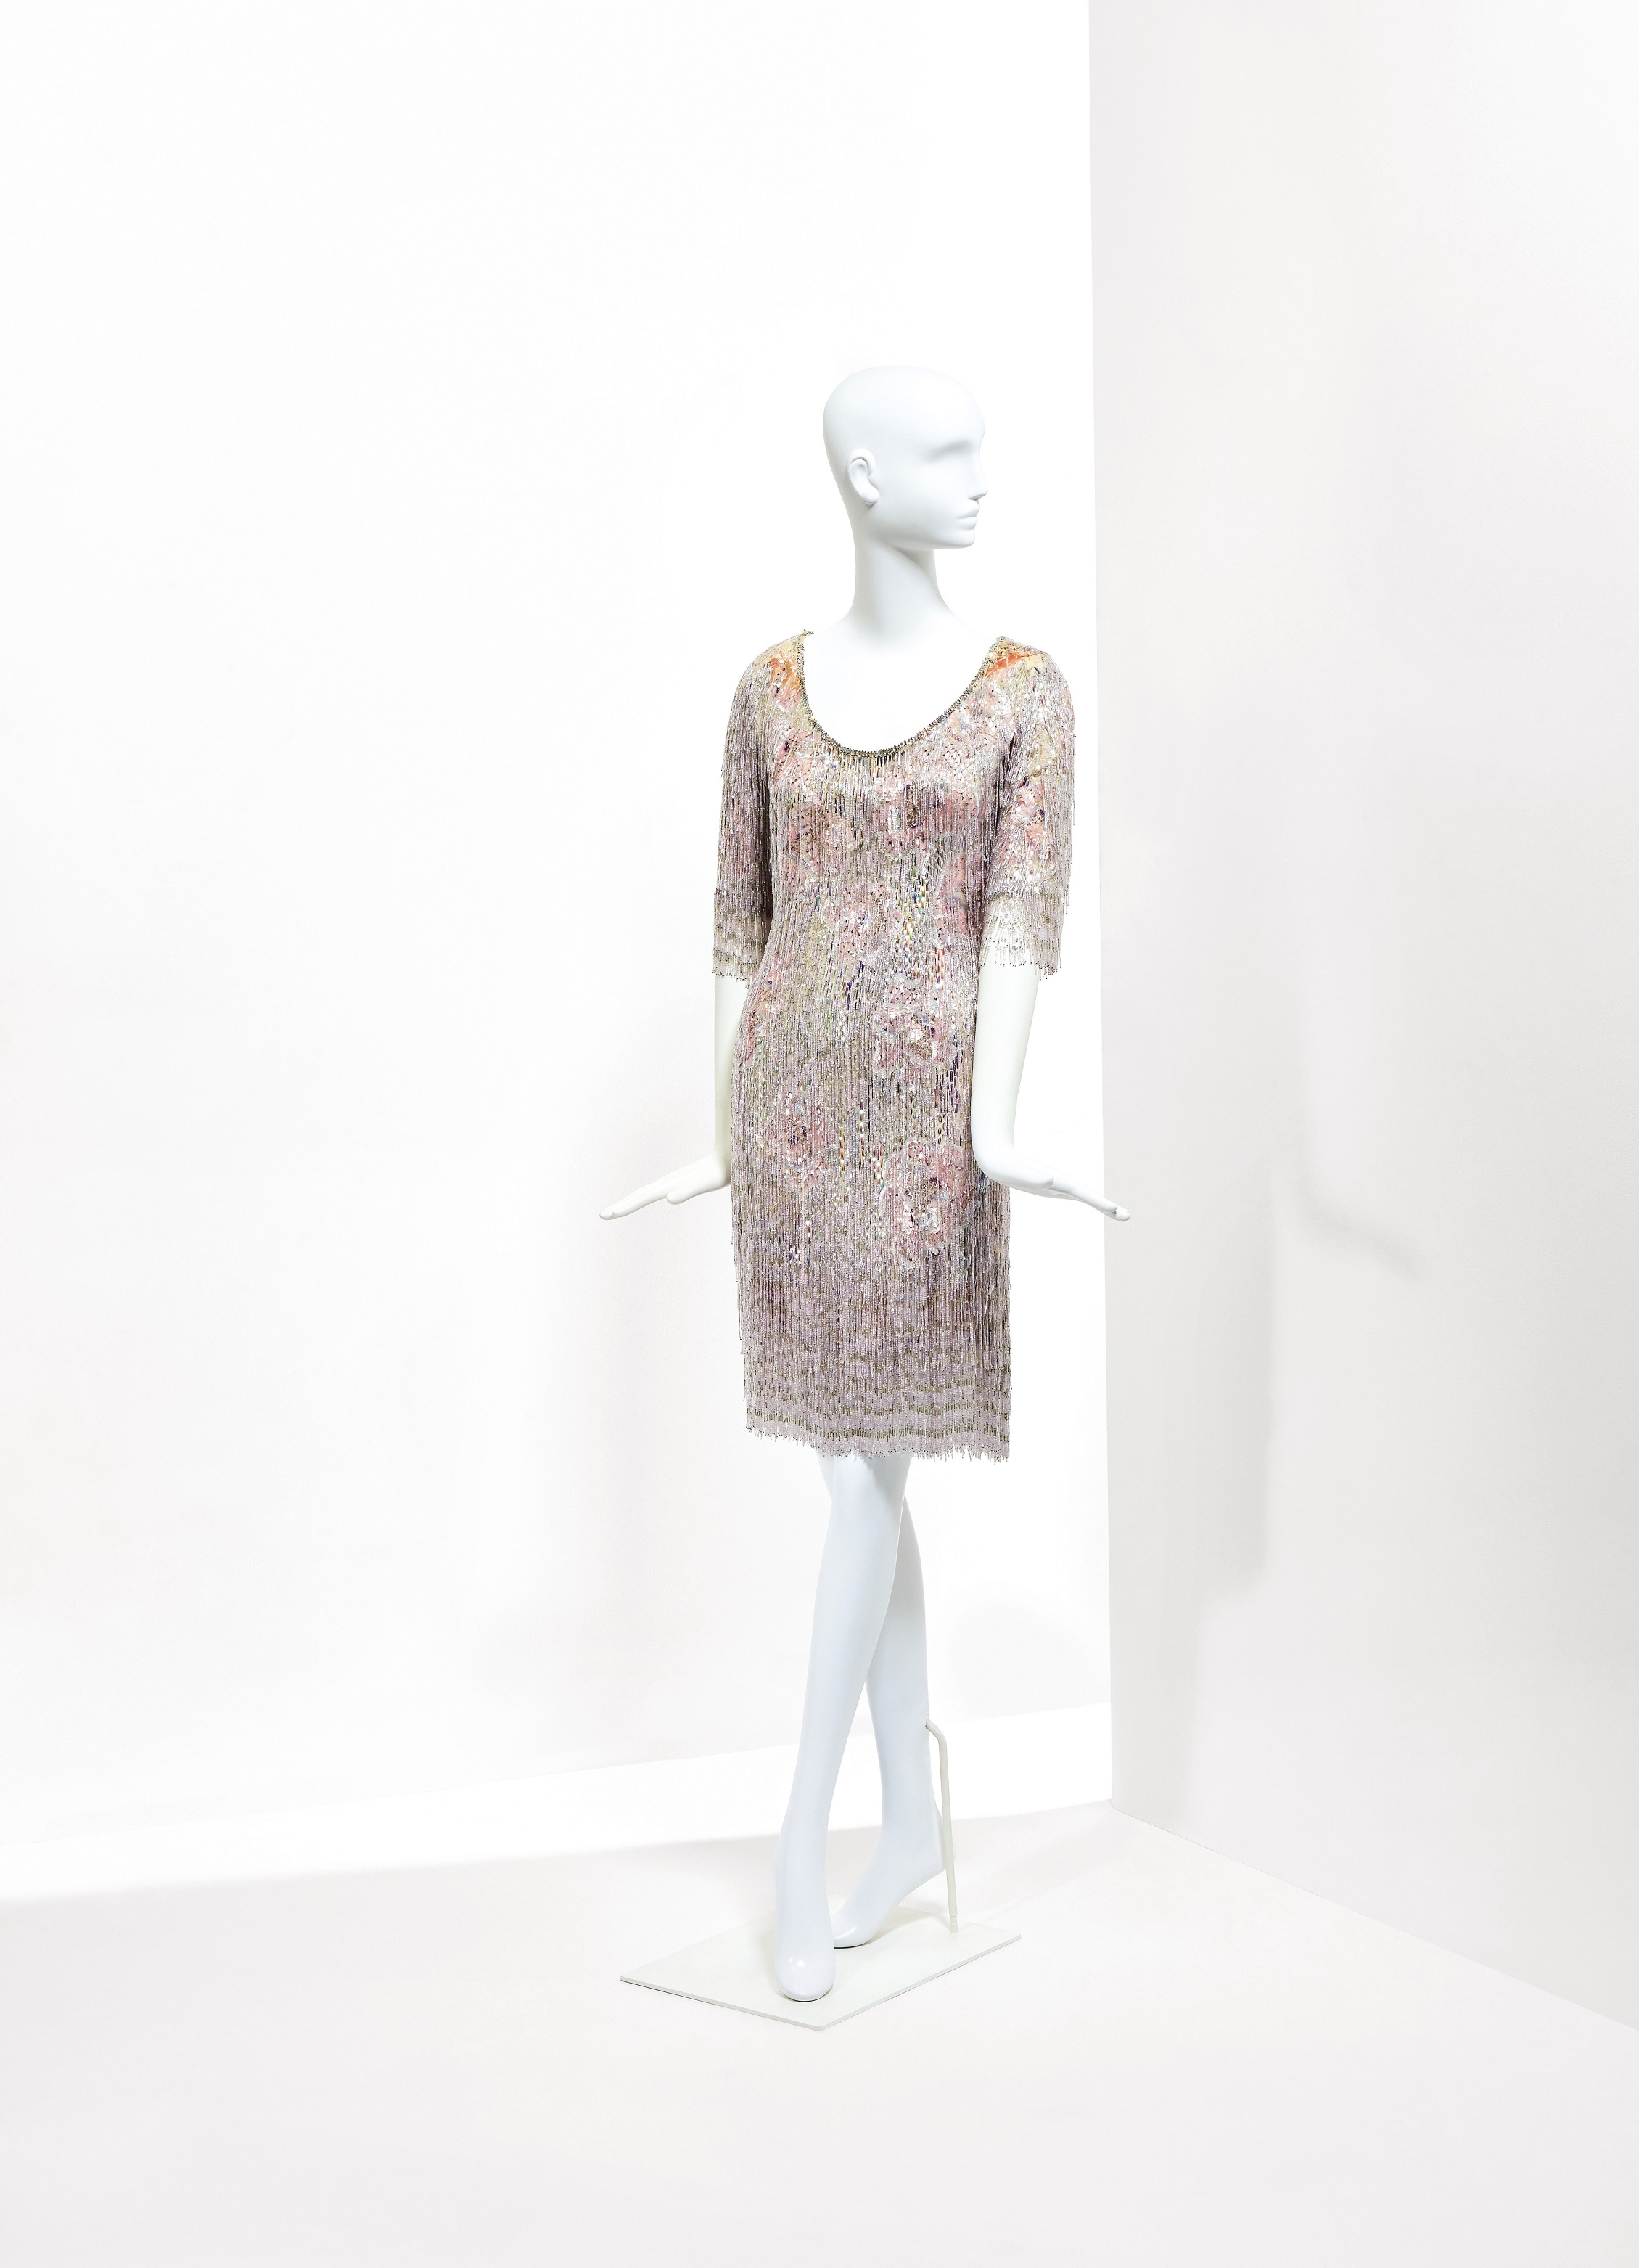 Catherine Deneuve's Yves Saint Laurent wardrobe: A beaded evening dress from spring 1969